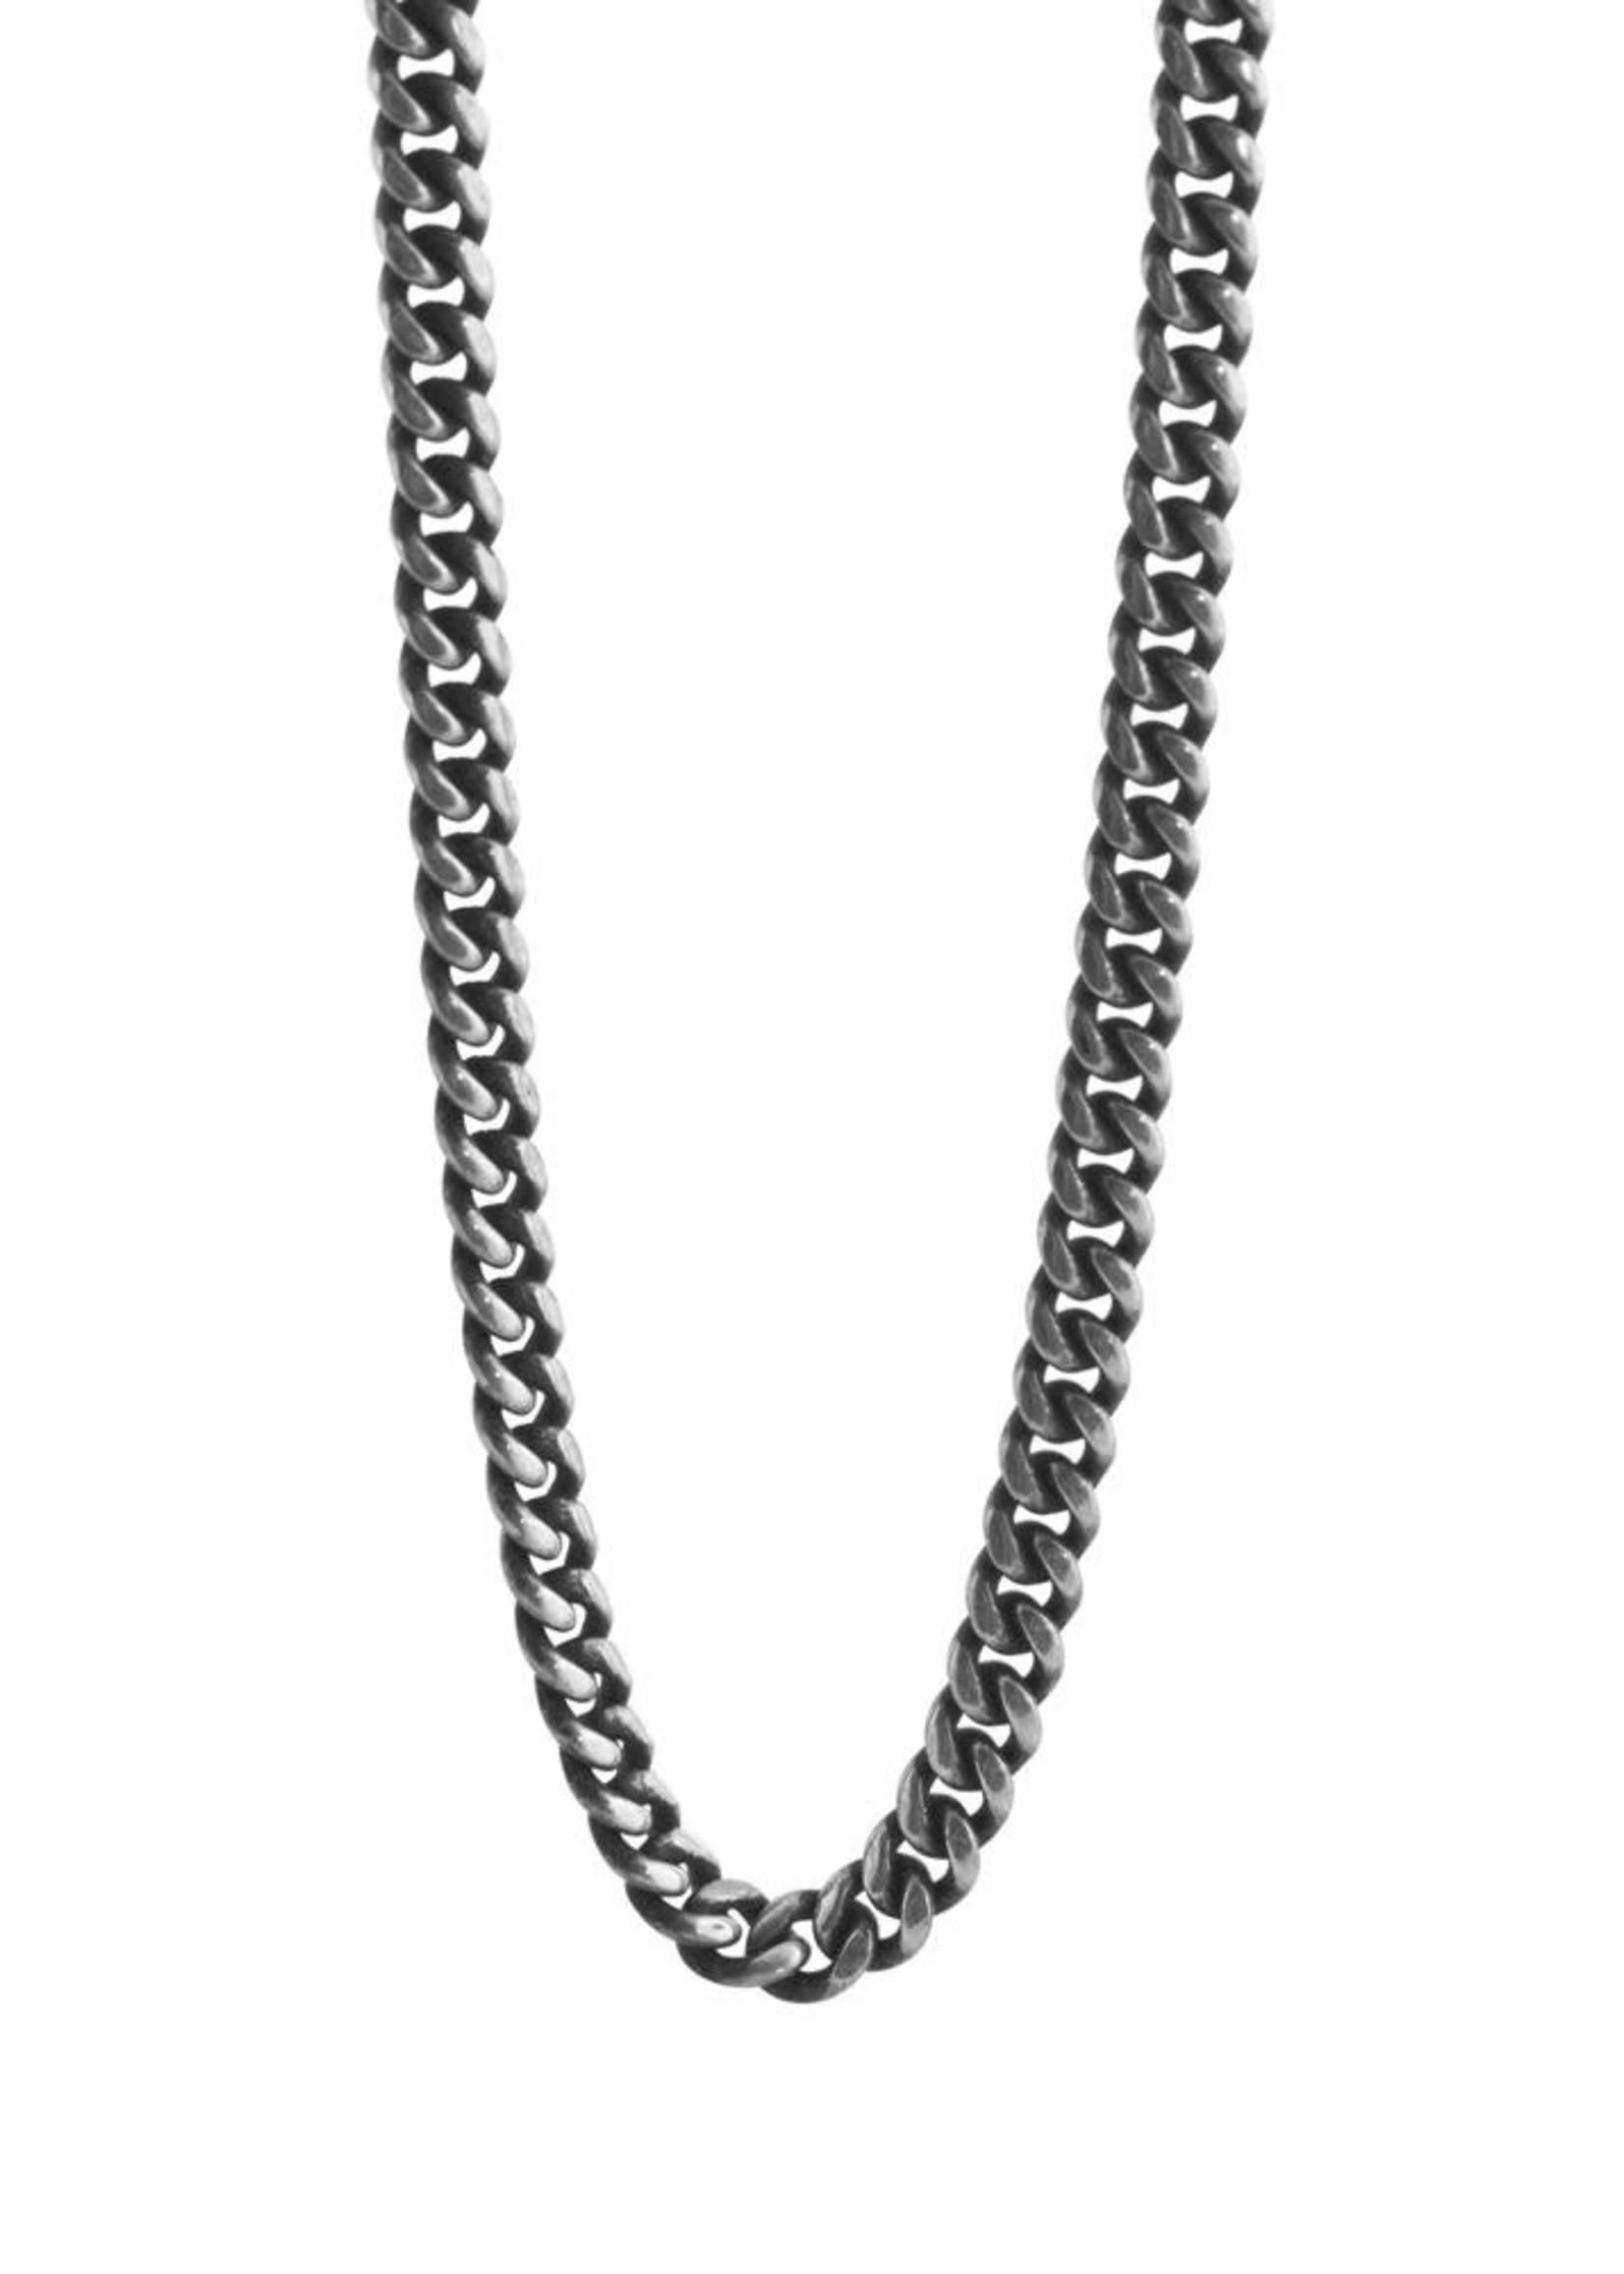 VARON Malo Chain in Sterling Silver